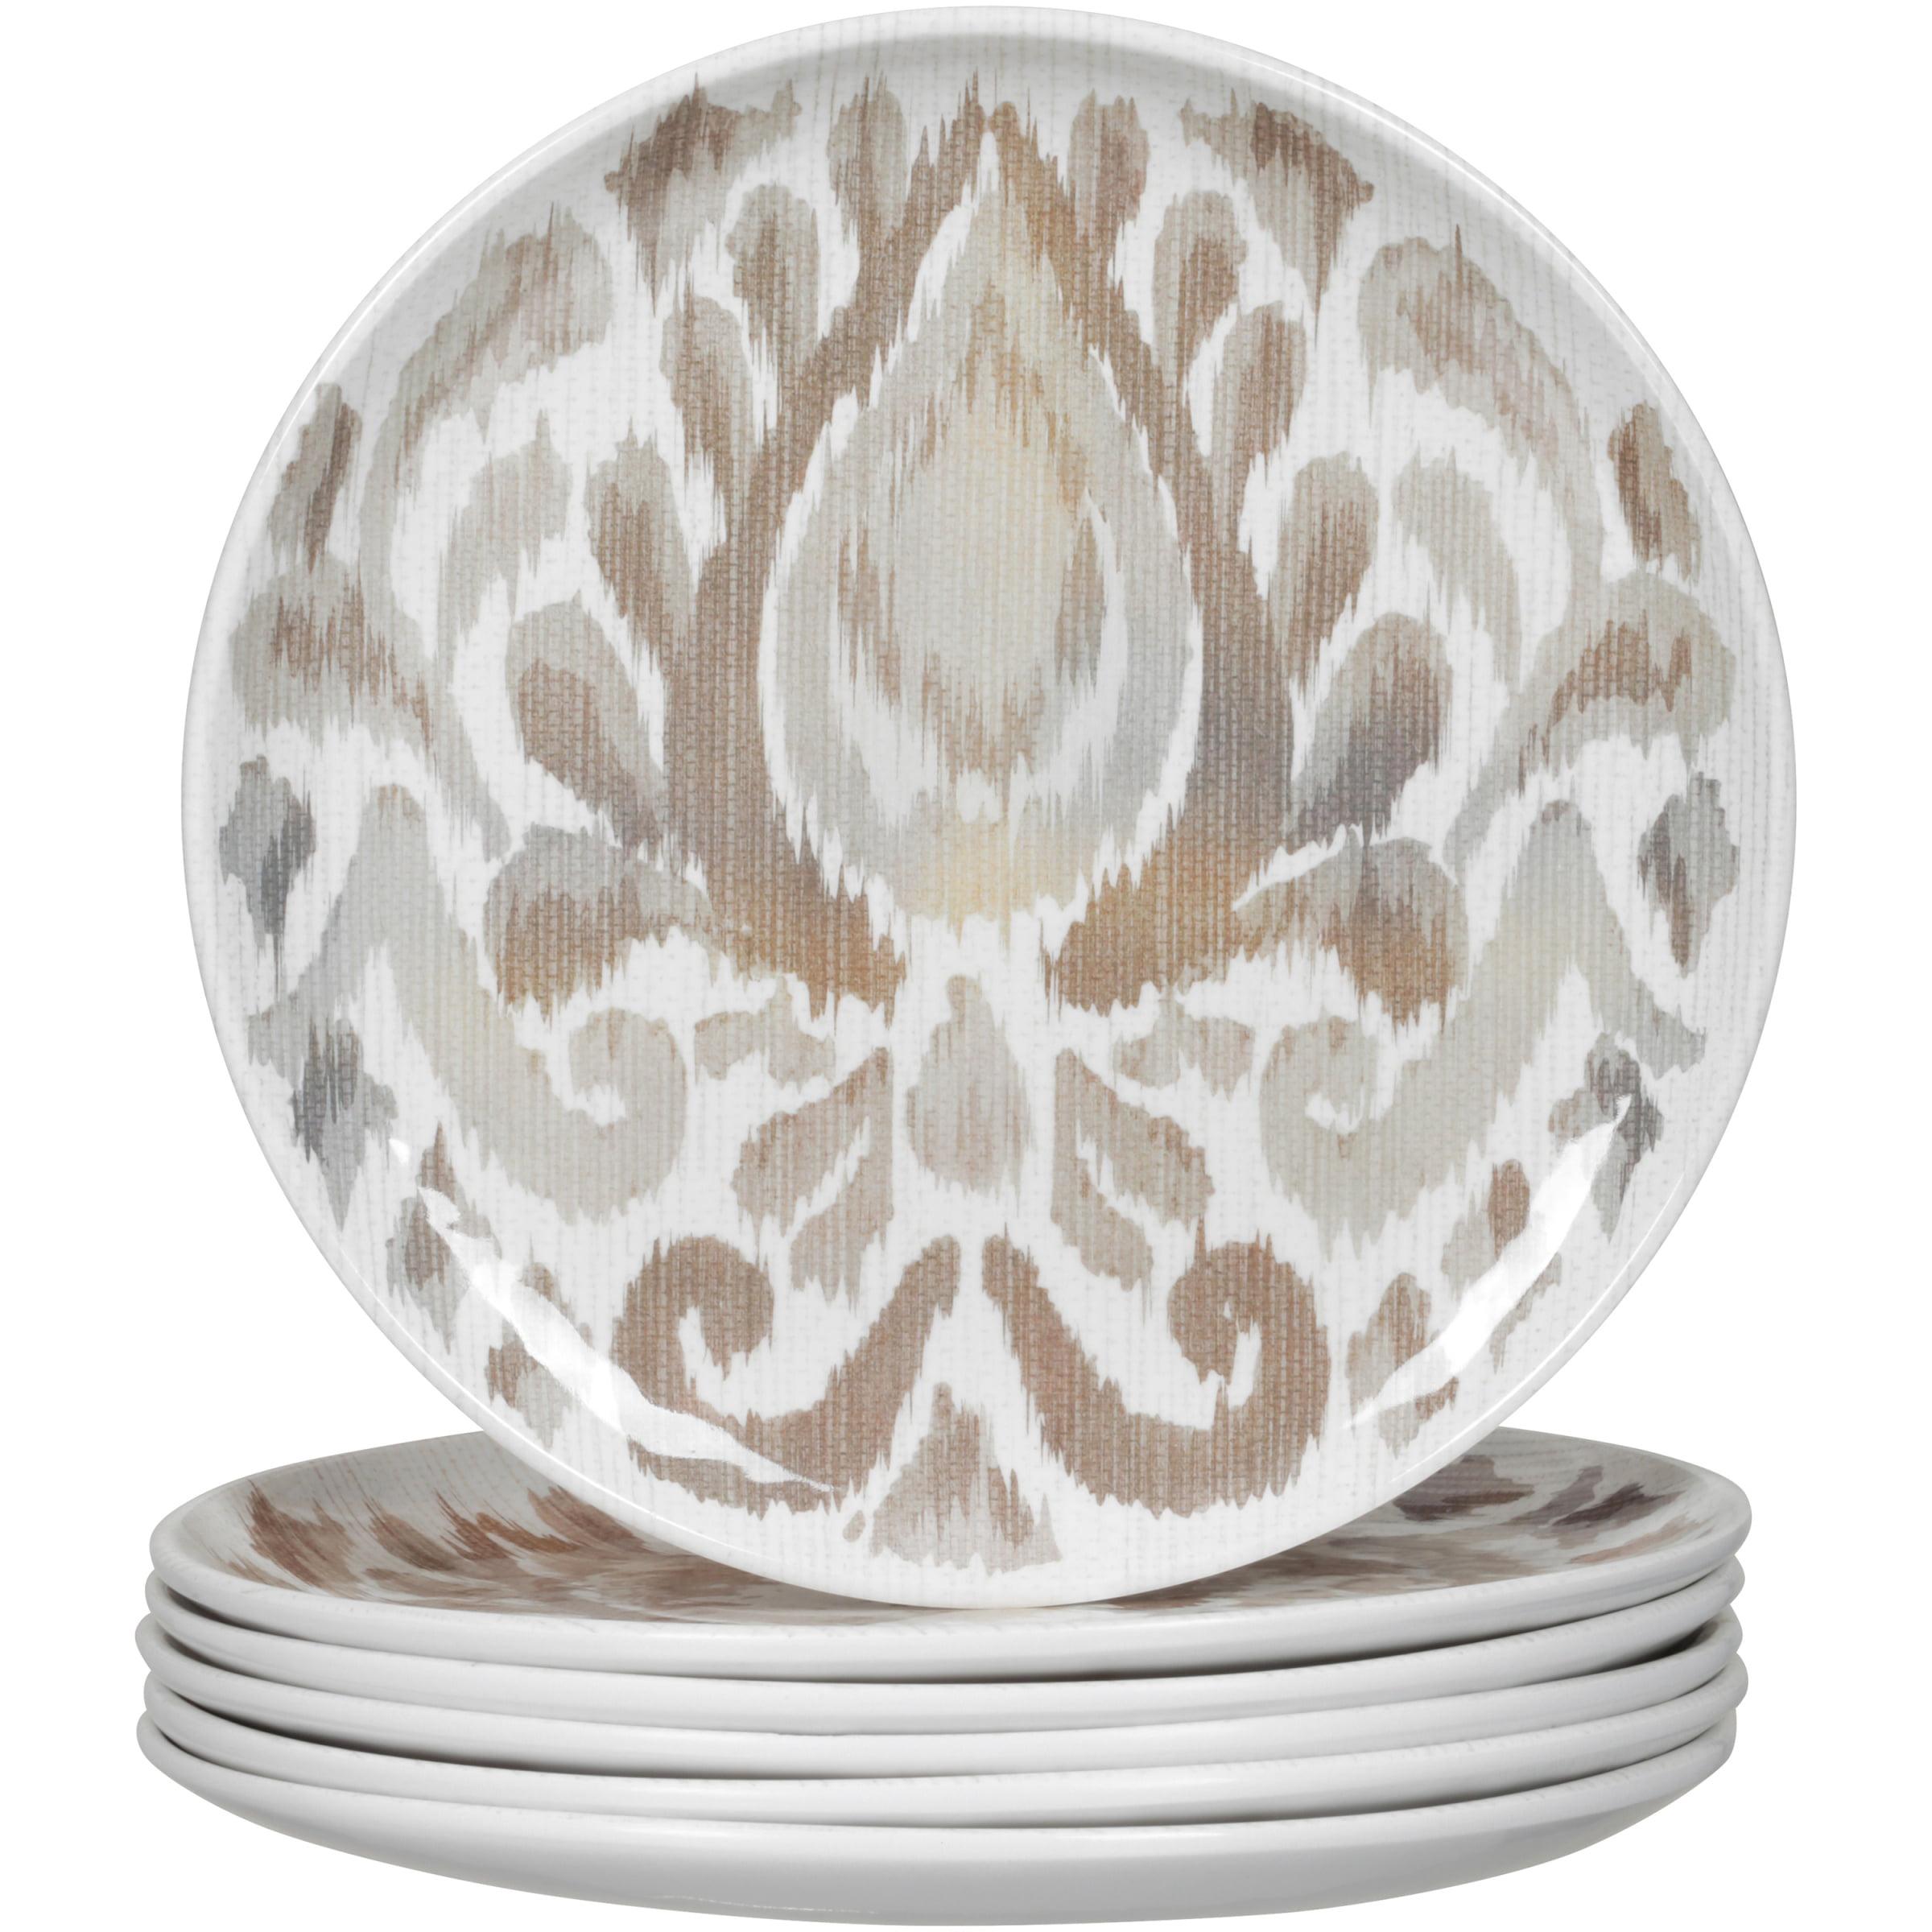 Better Homes & Gardens™ 6-piece Gray Ikat Melamine Salad Plate Set